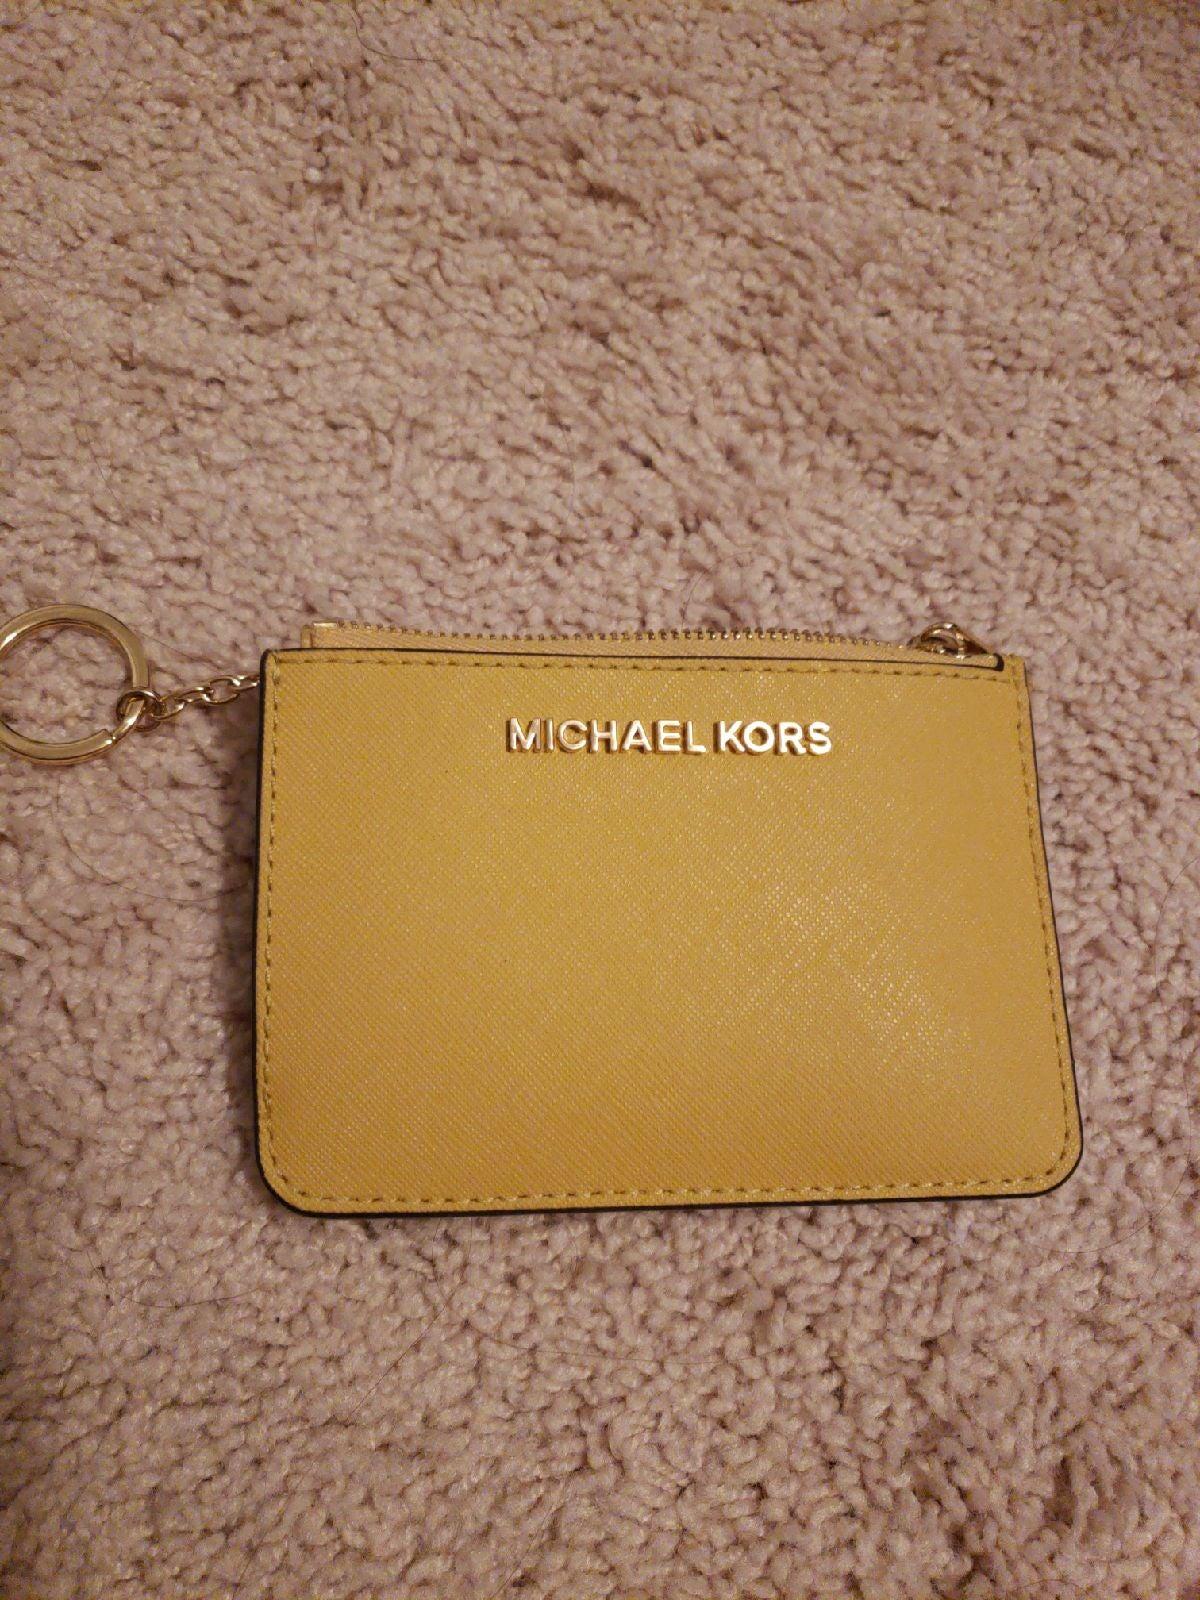 Michael kors keychain jet set wallet